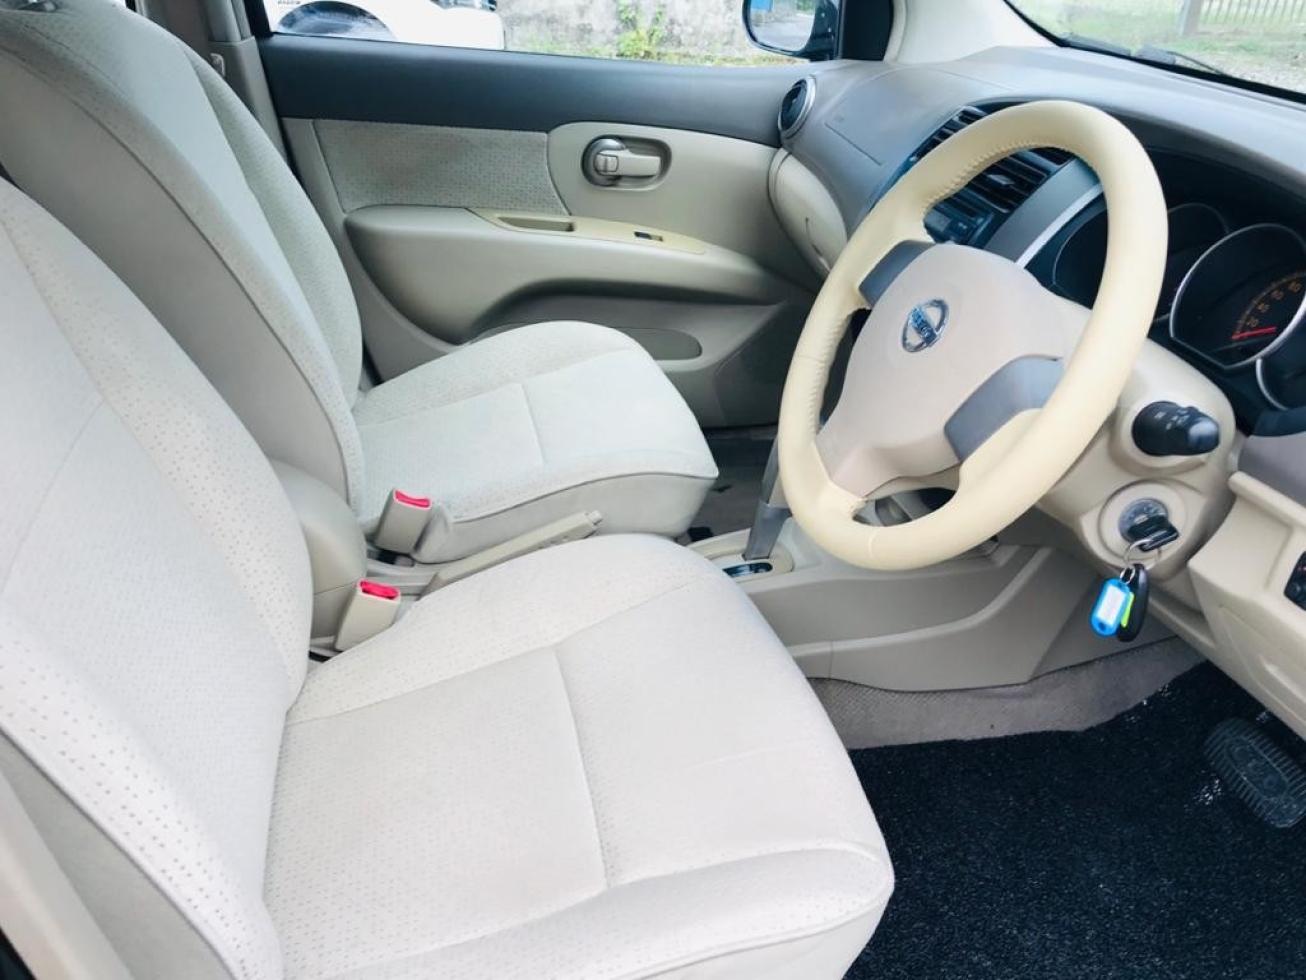 2011 Nissan GRAND LIVINA 1.6 CLASSIC/COMFORT (A)